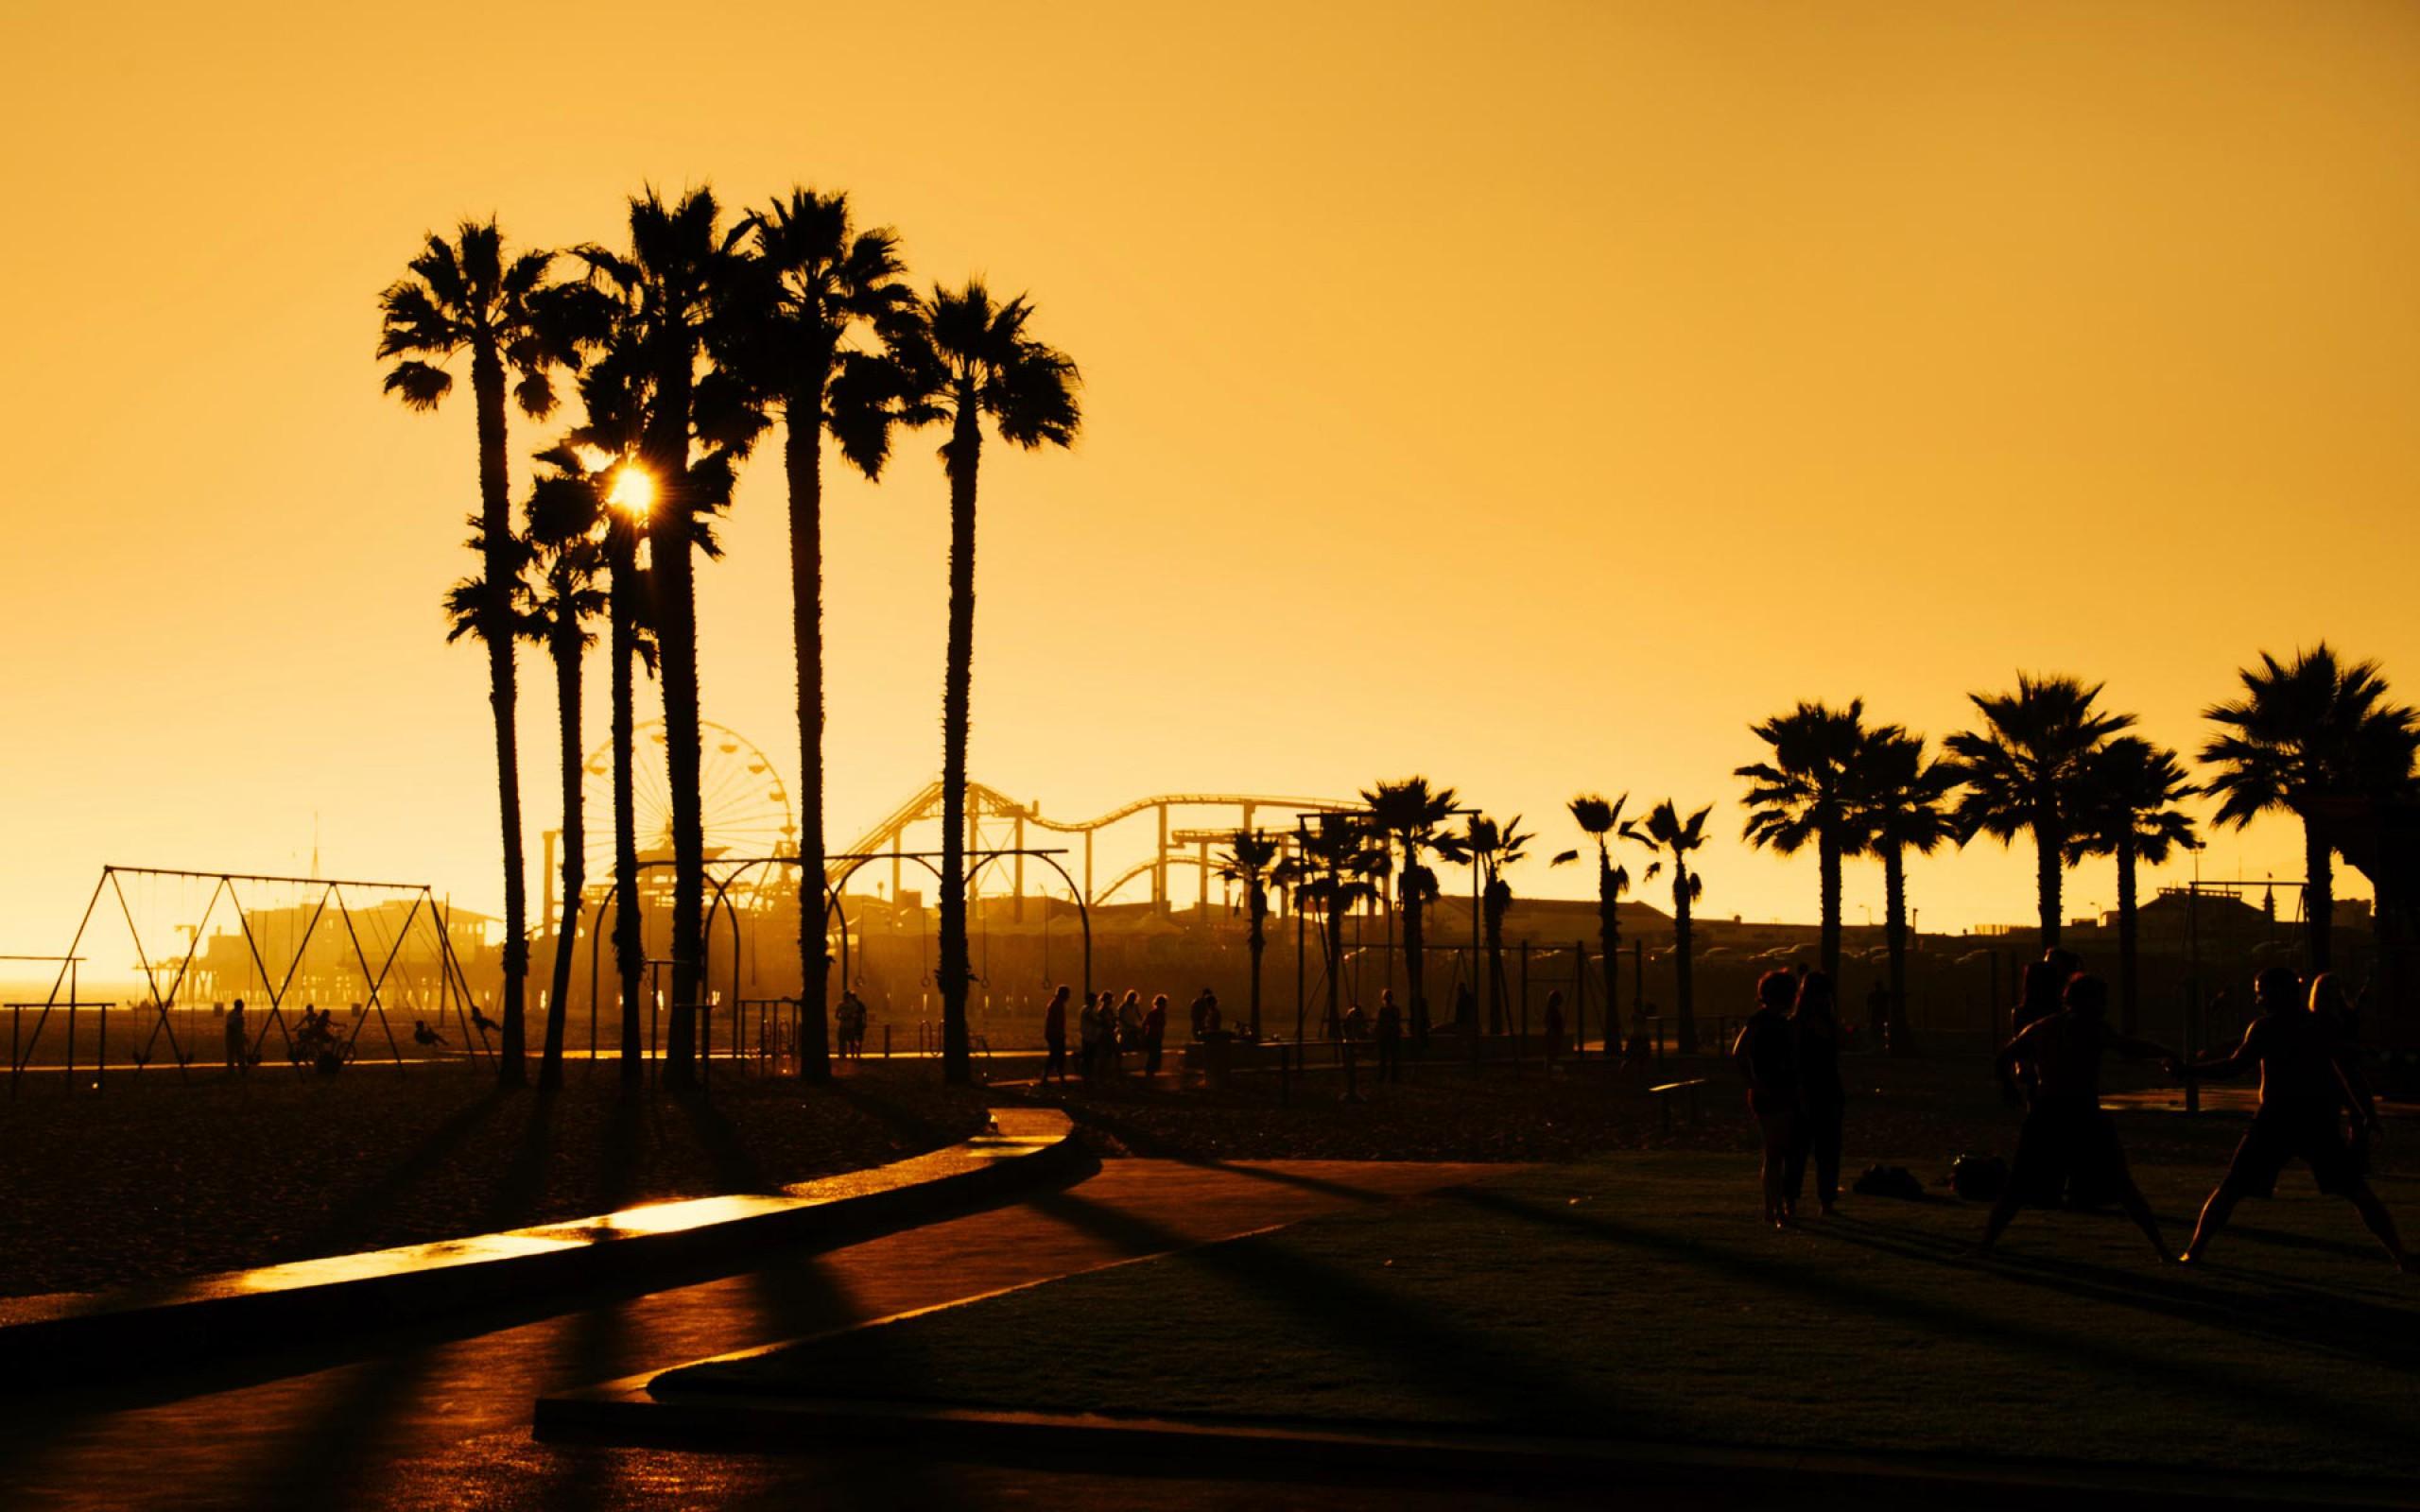 Santa Monica California Beach Sunset Wallpaper in High Resolution at 2560x1600